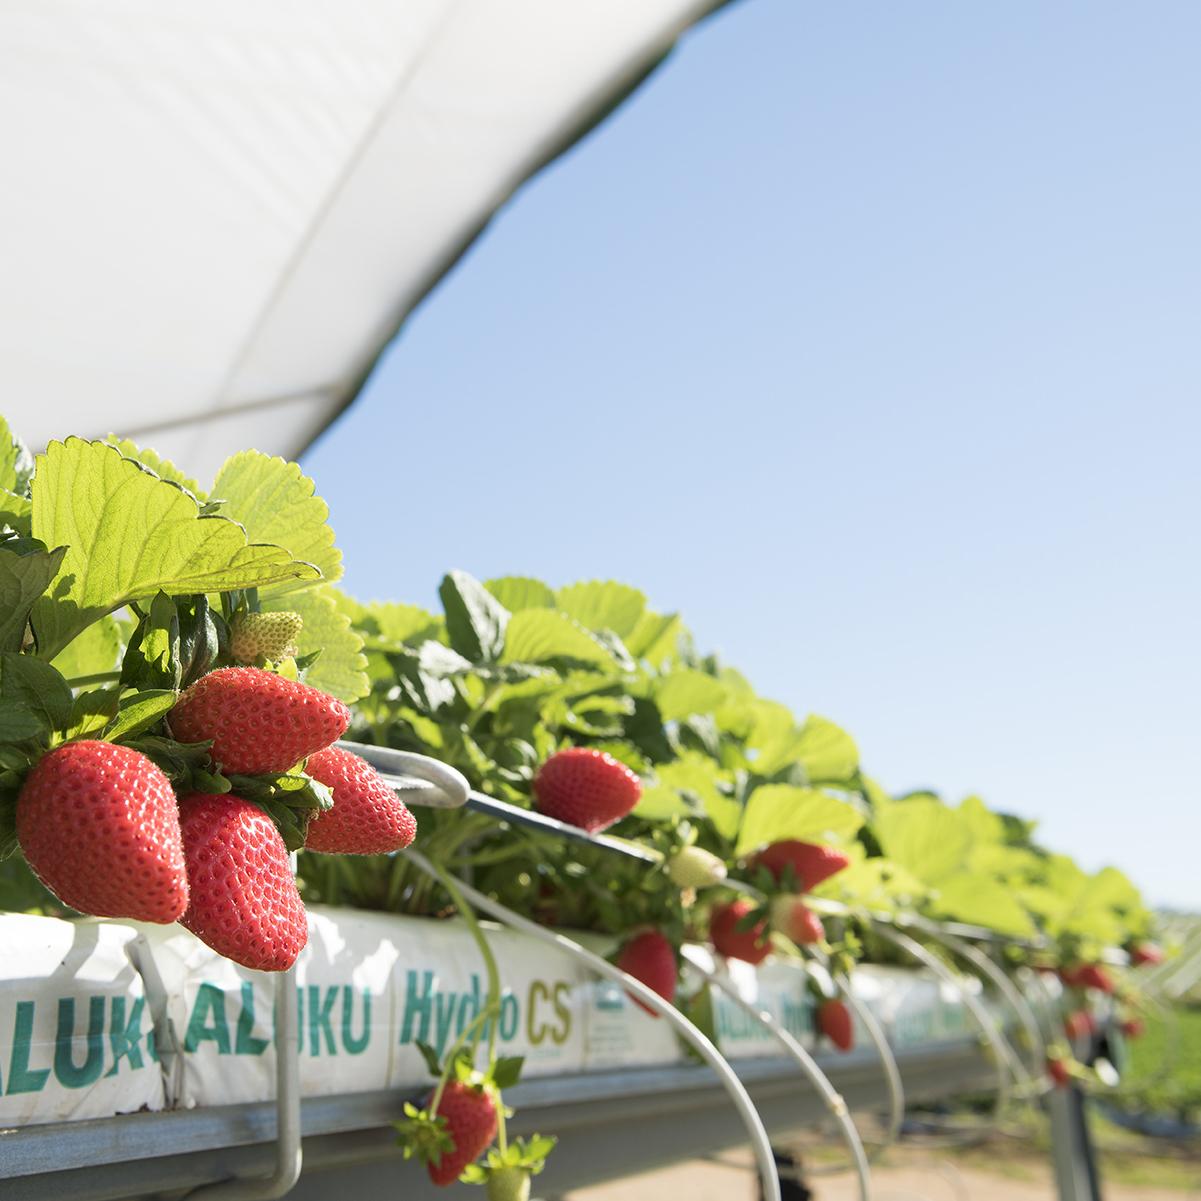 BerryWorld Farms